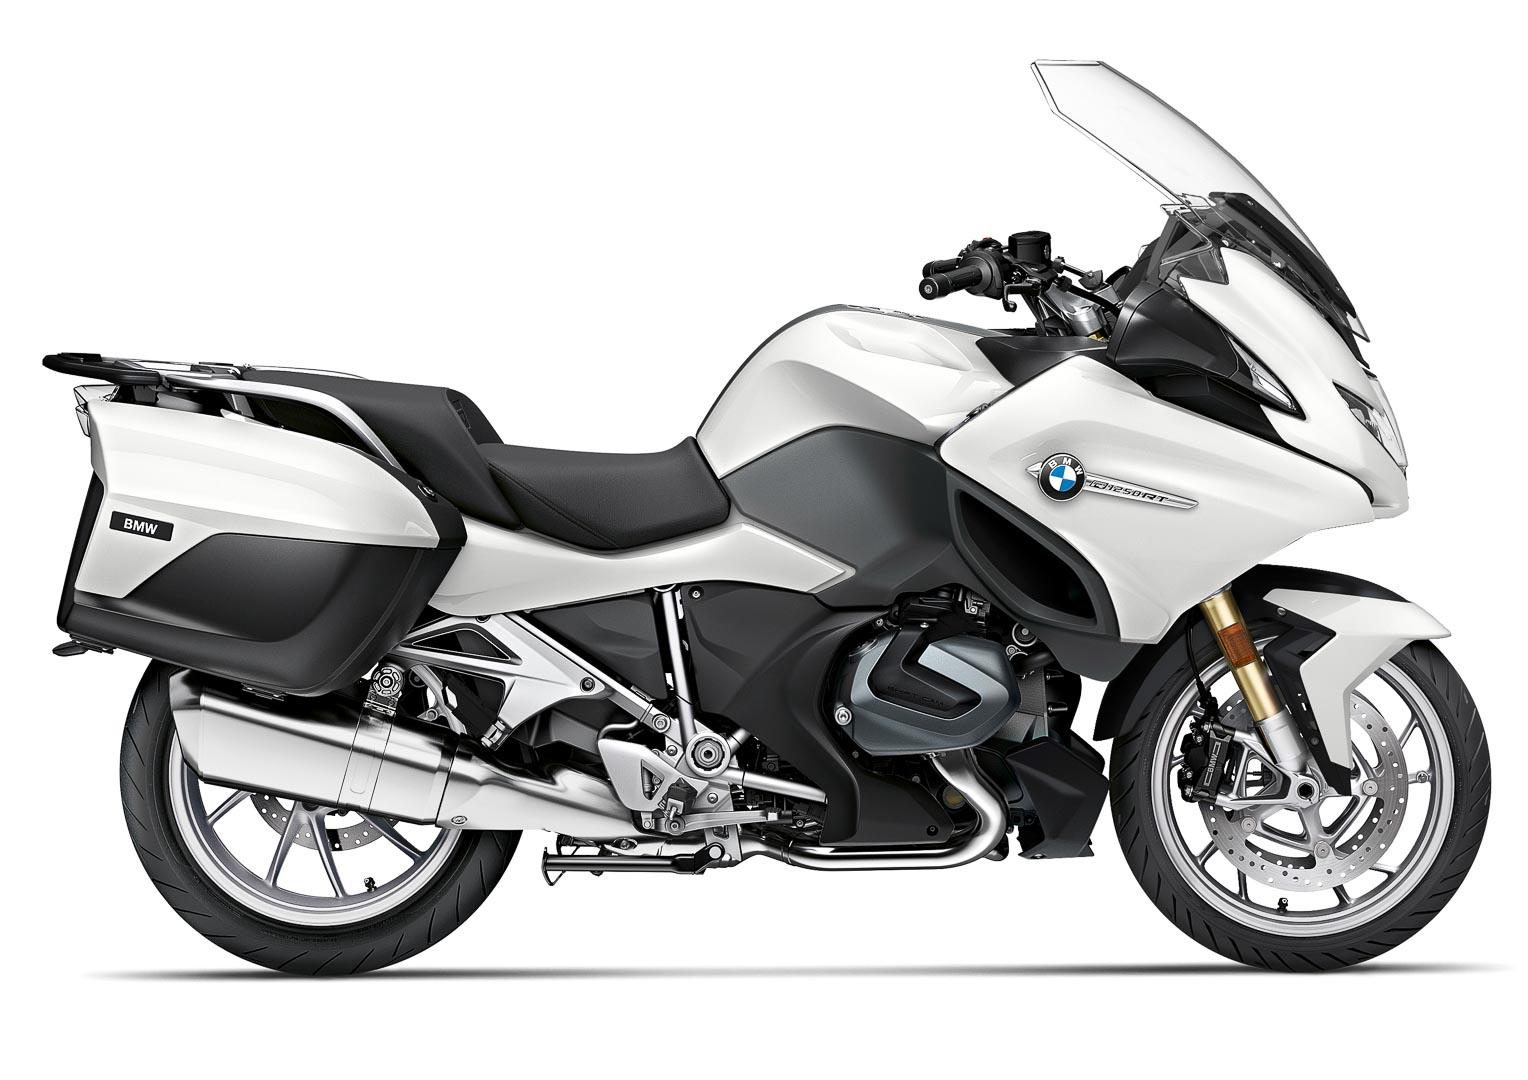 2021 BMW R 1250 RT: Colors